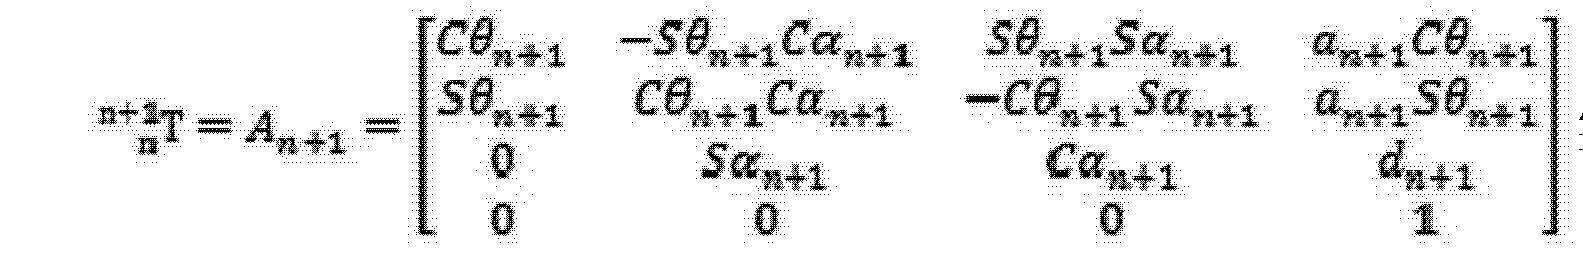 Figure CN104002307AD00041